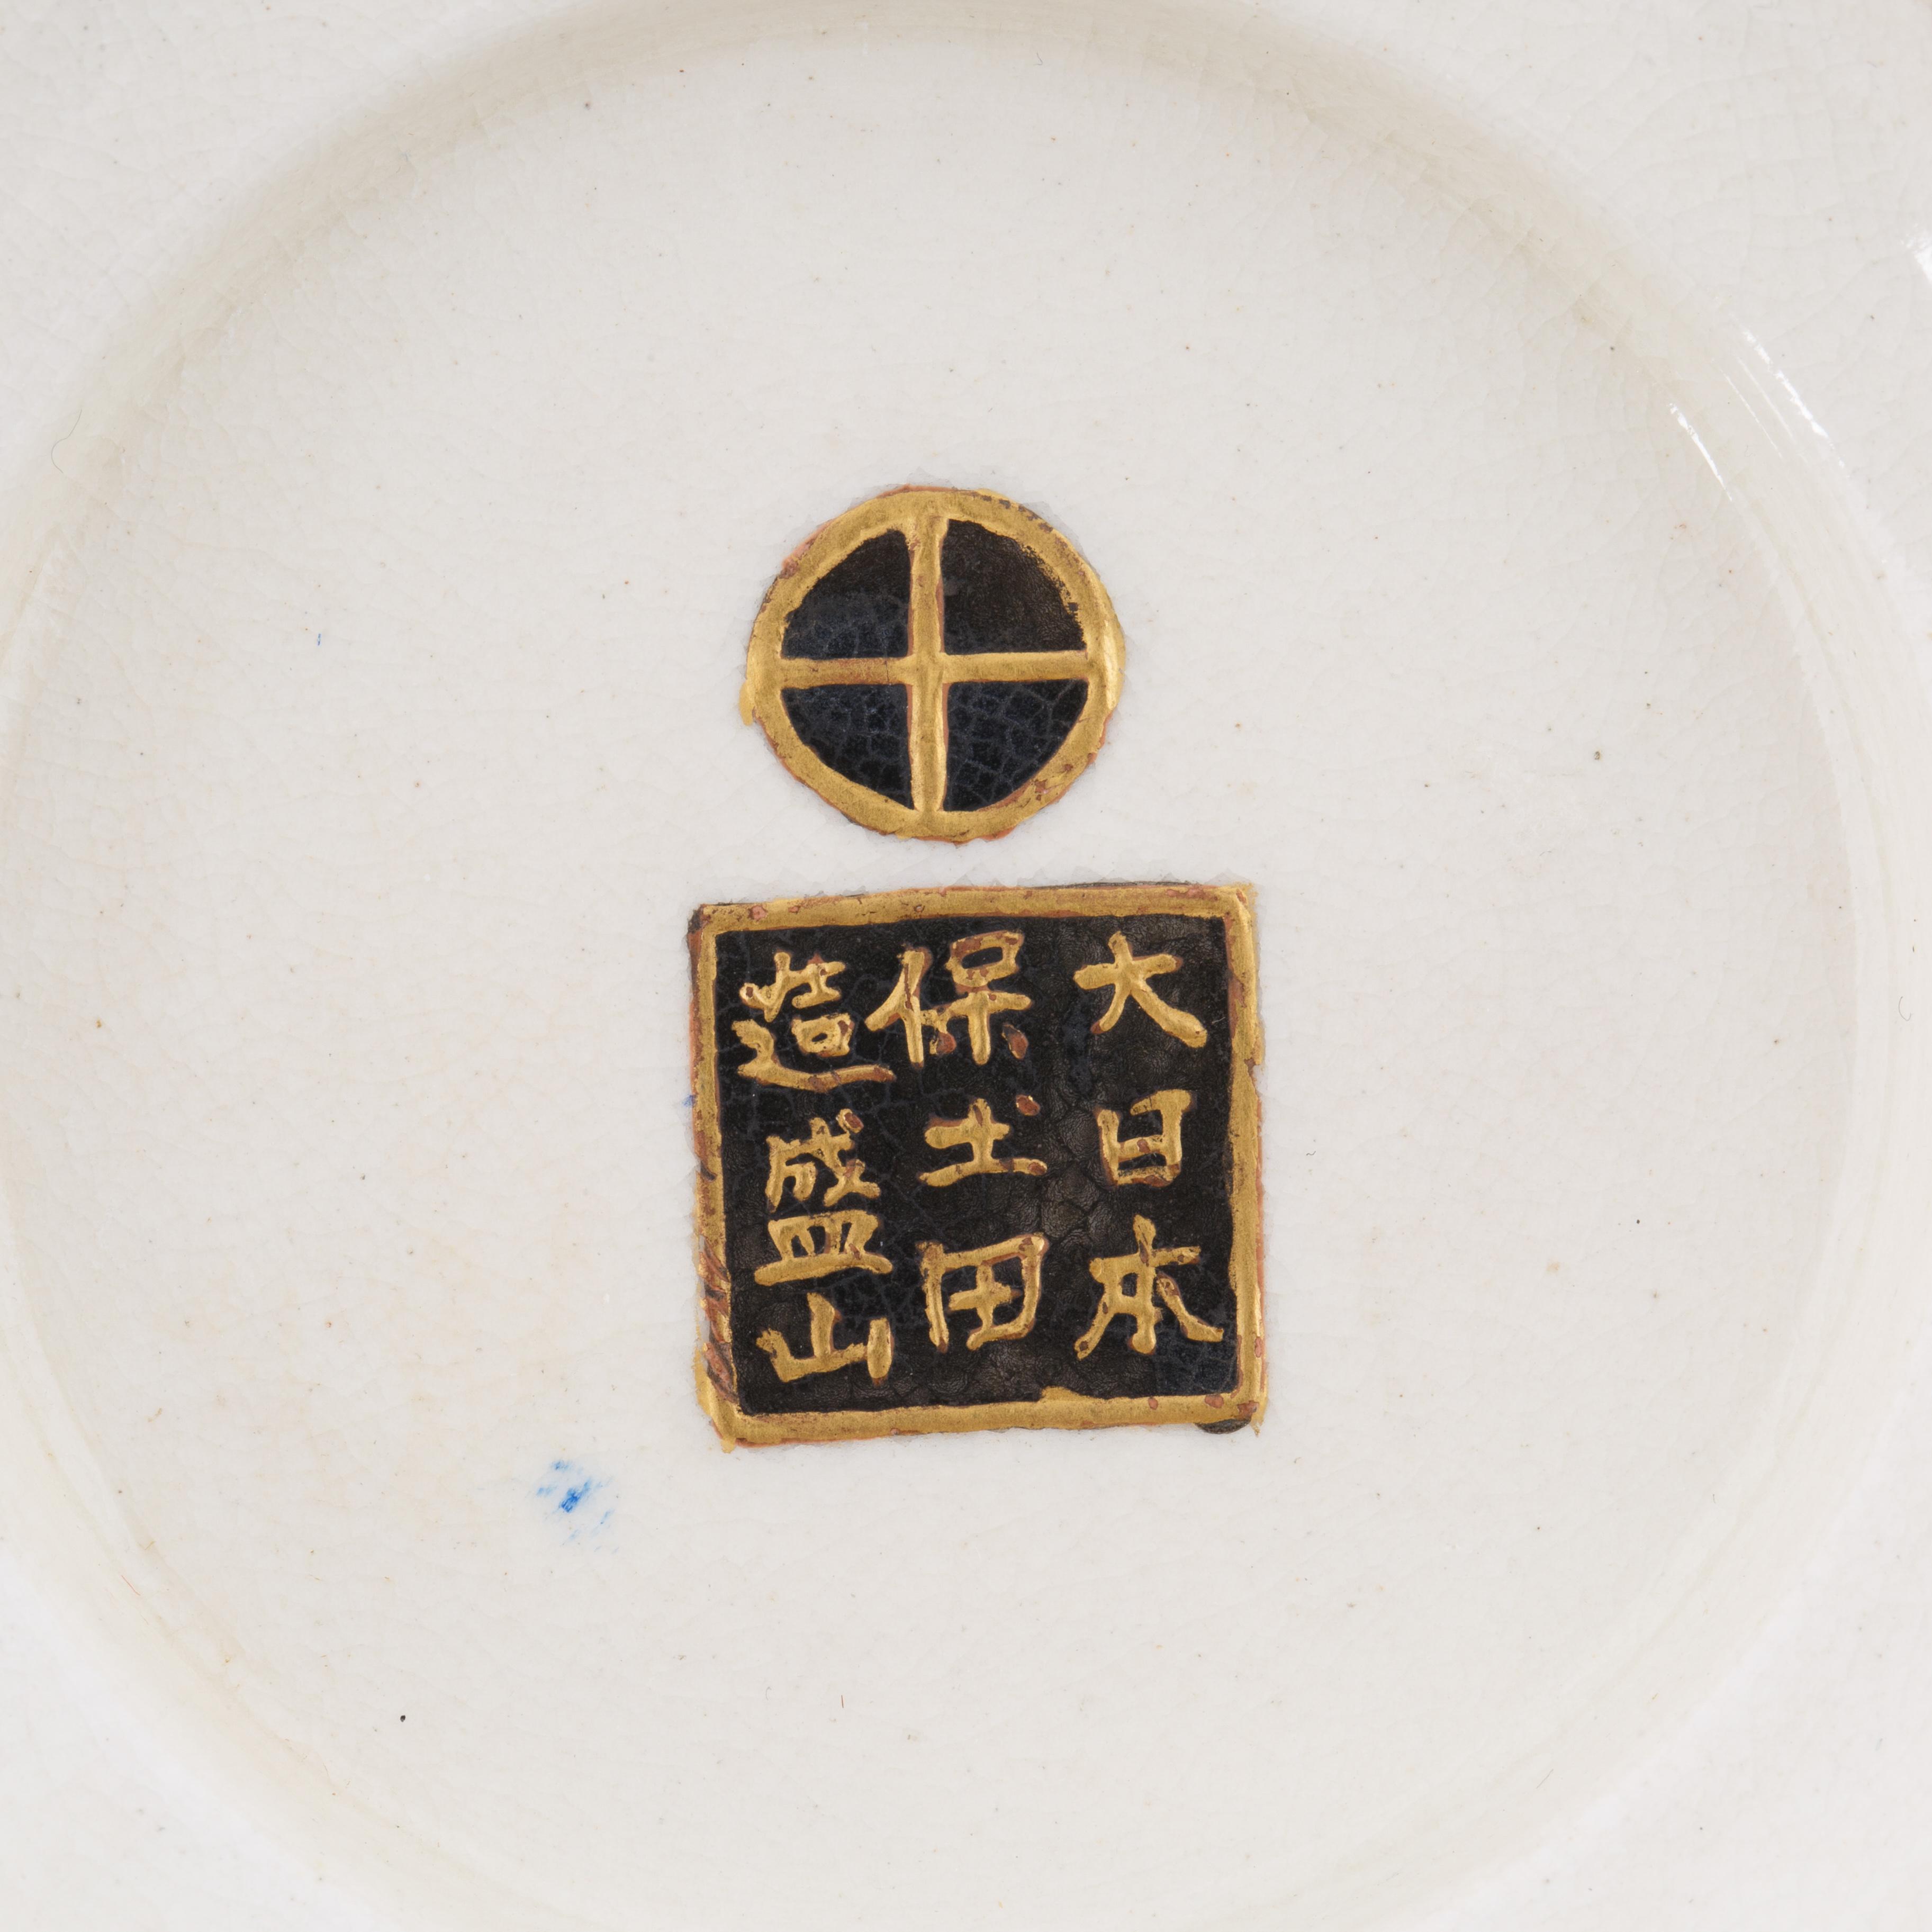 CIRCA 1912-1926 SMALL JAPANESE PORCELAIN SATSUMA DISH - Image 4 of 4